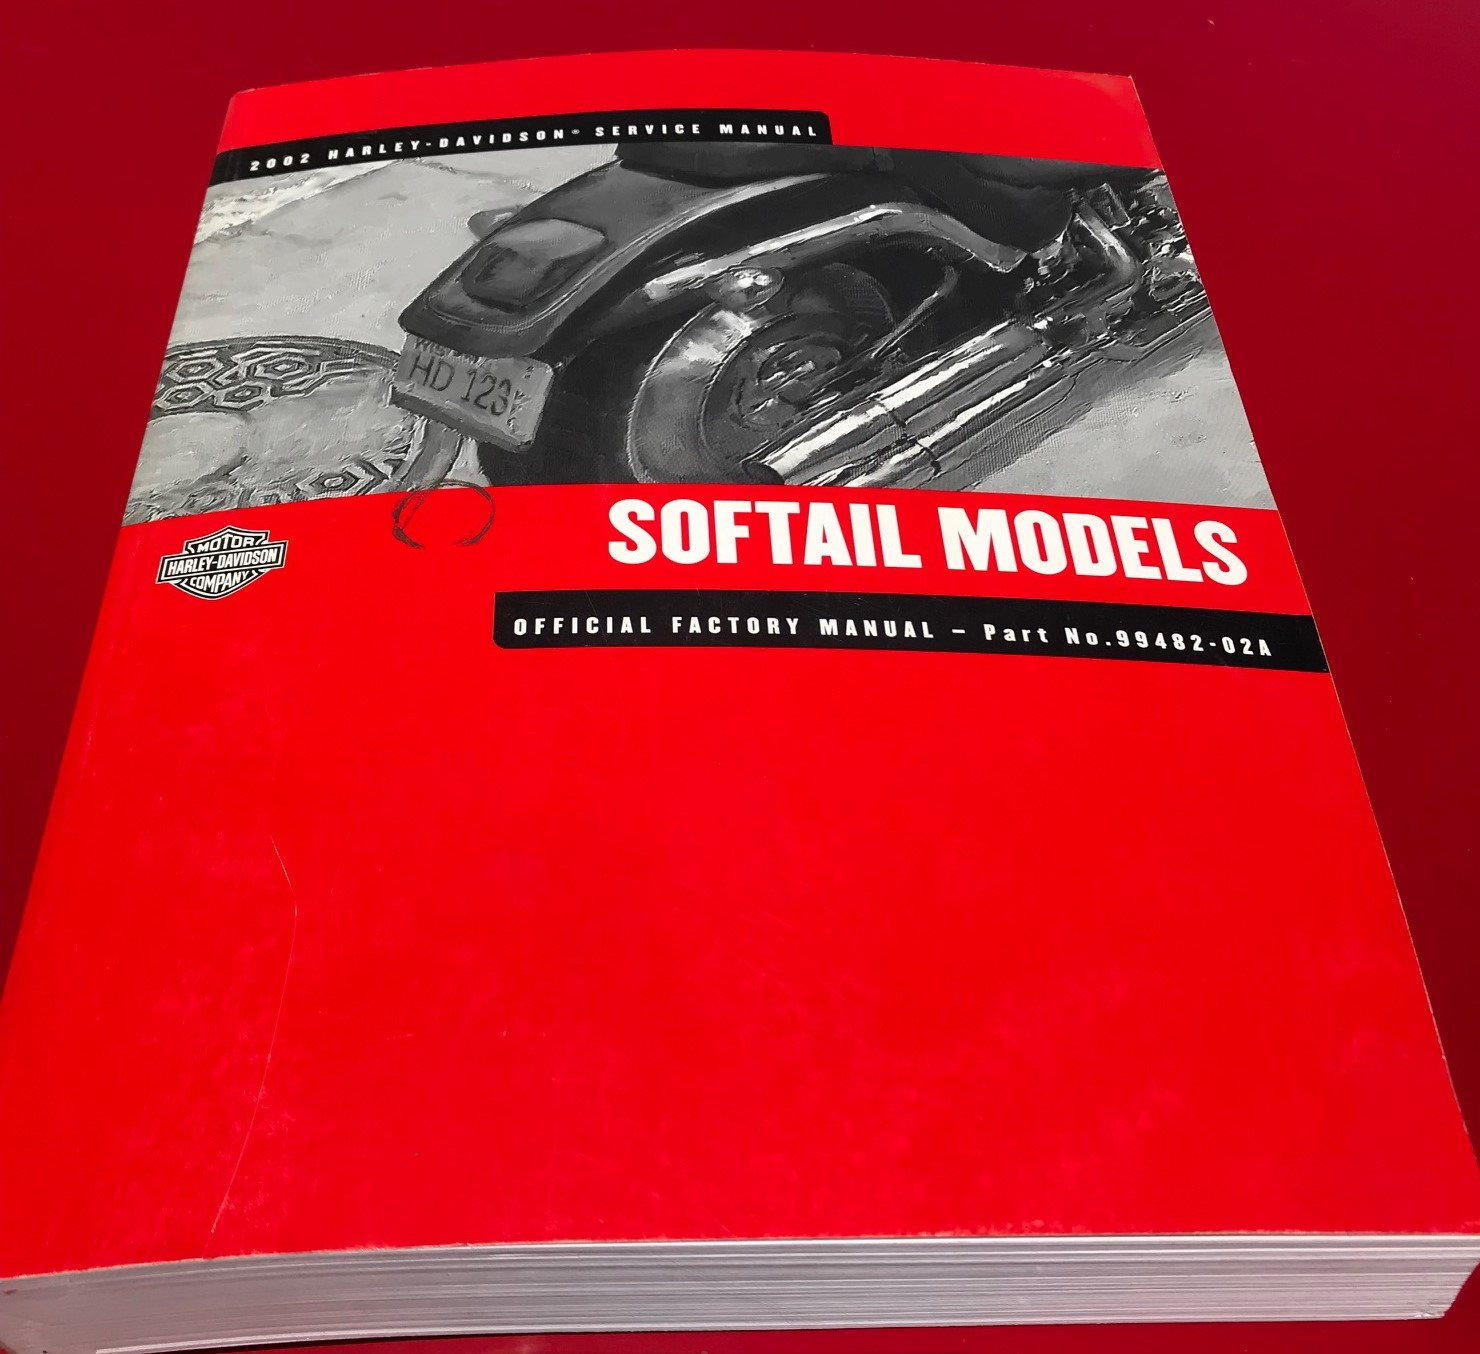 2002 Softail Service Manual - Harley Davidson Forums